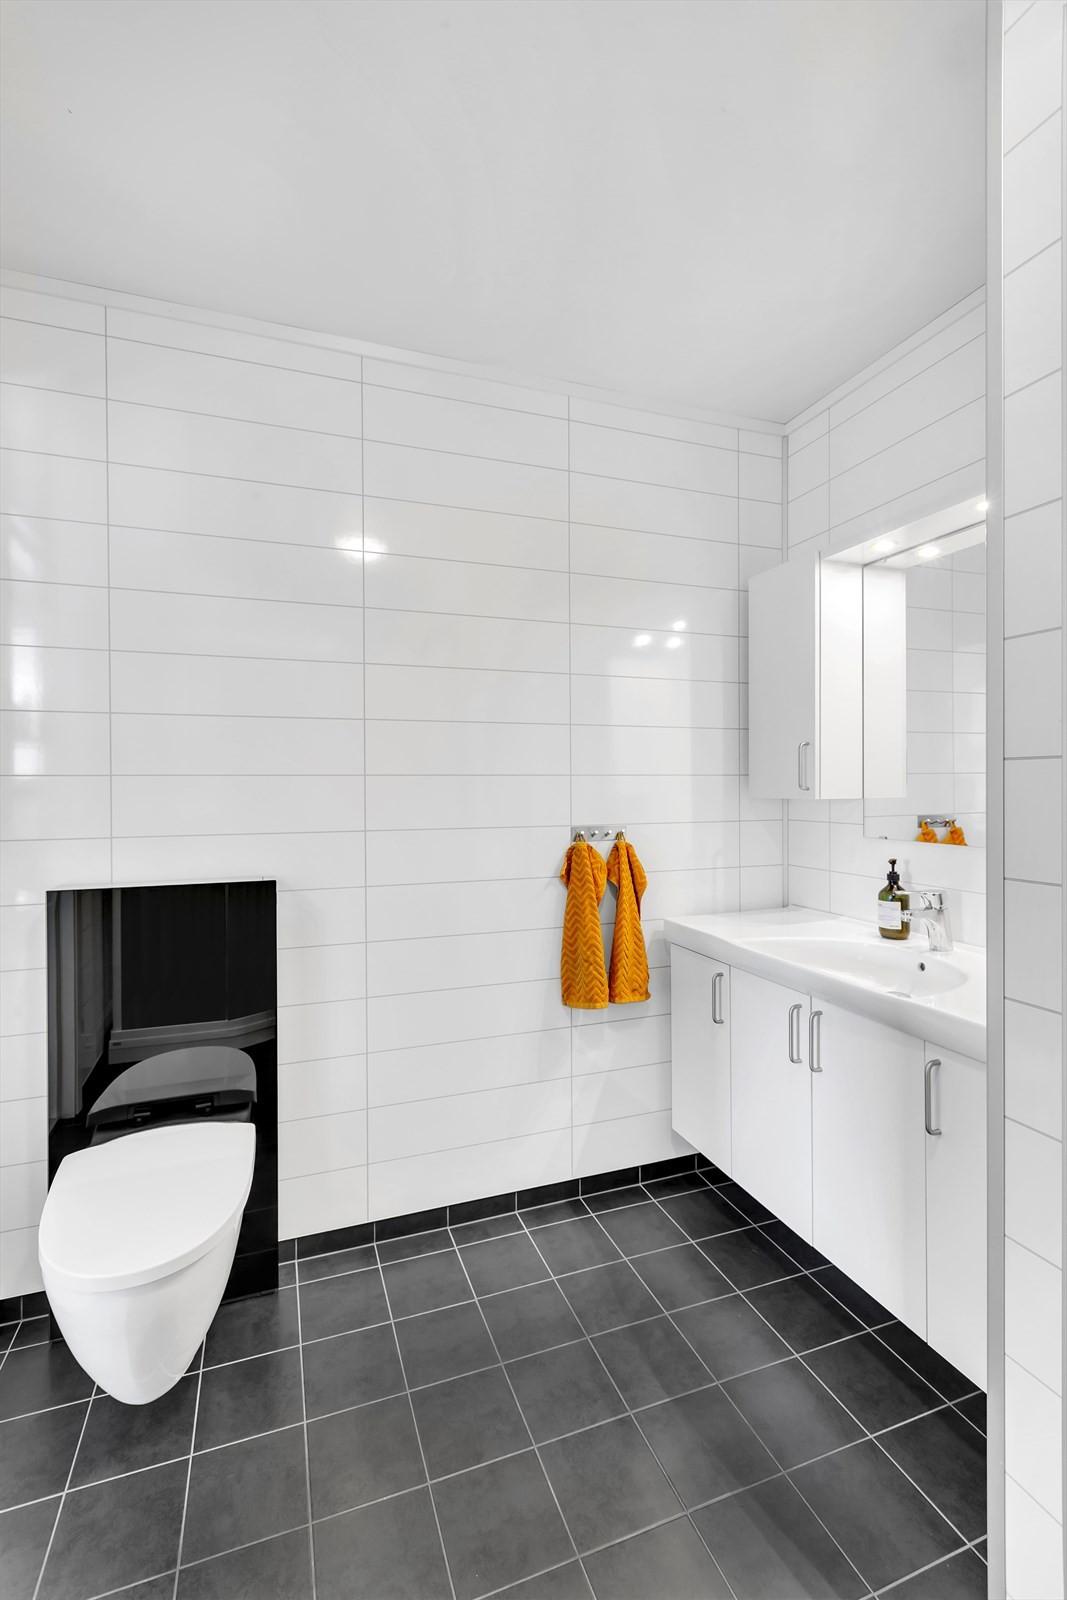 Bad med fliser på gulv samt vannbåren varme